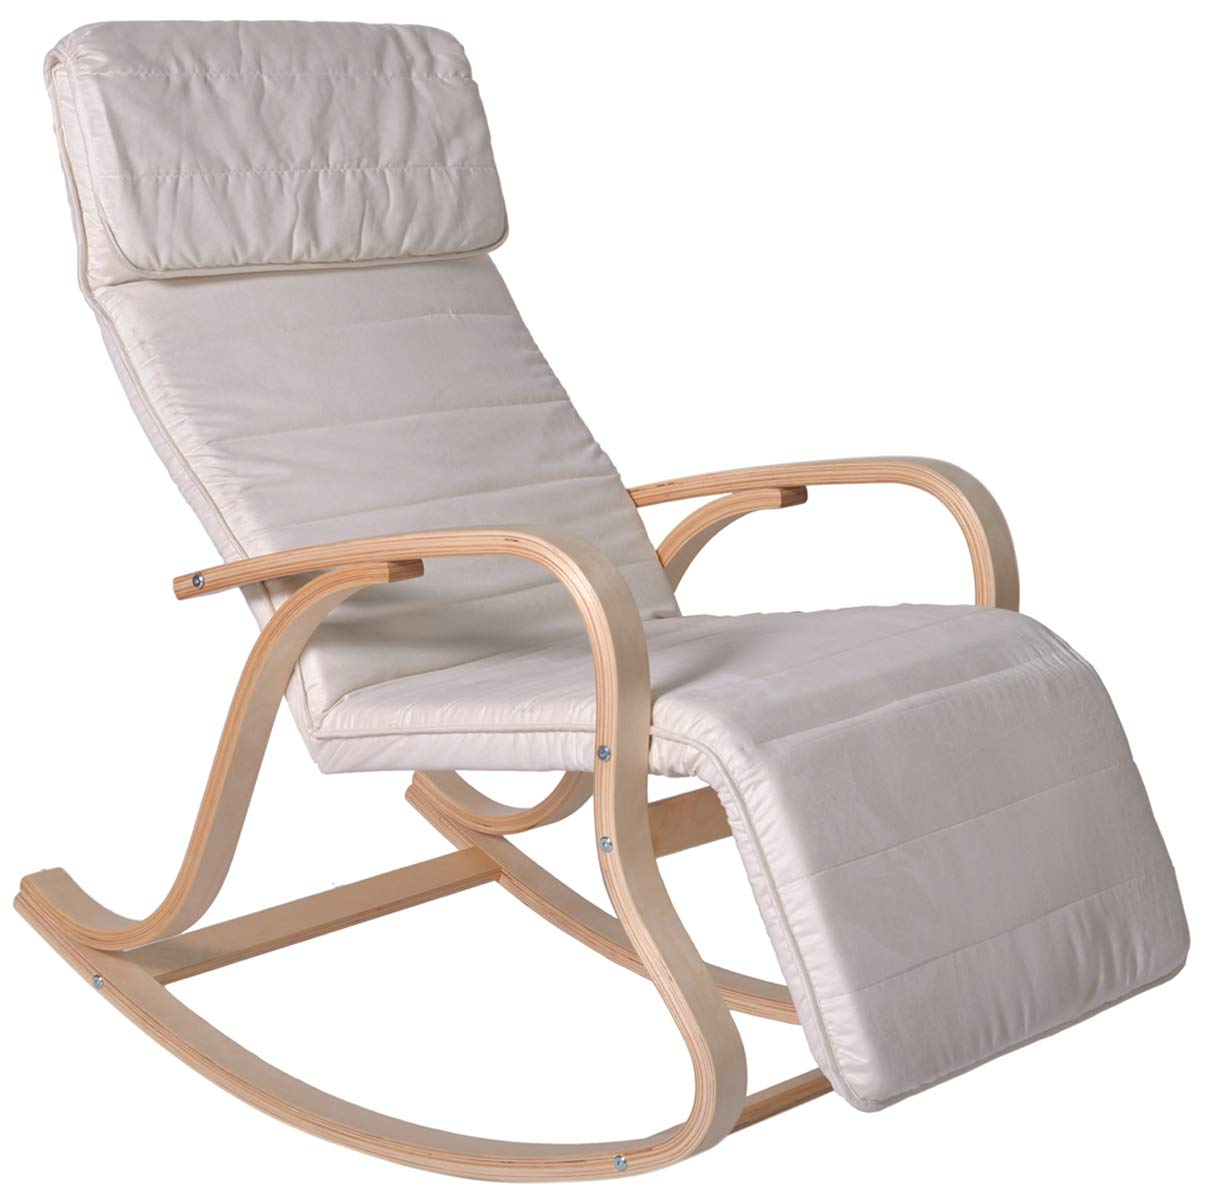 PEGANE Rocking-Chair Multipositions Alex II en Alcantara Cr/ème L65 x H91 x P101 cm